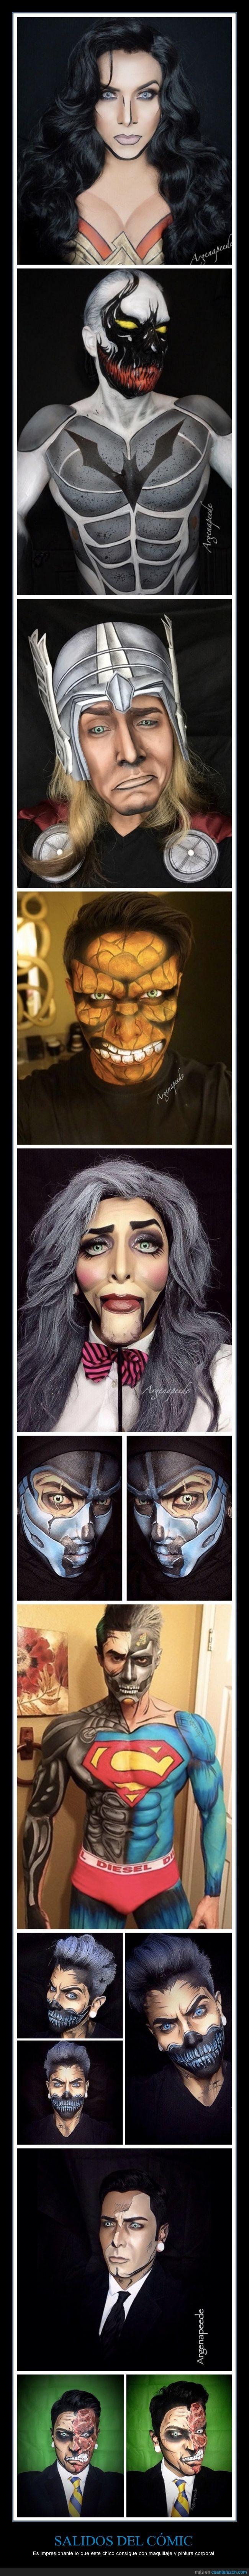 chico,comic,maquillaje,special fx,sub-zero,wonder woman